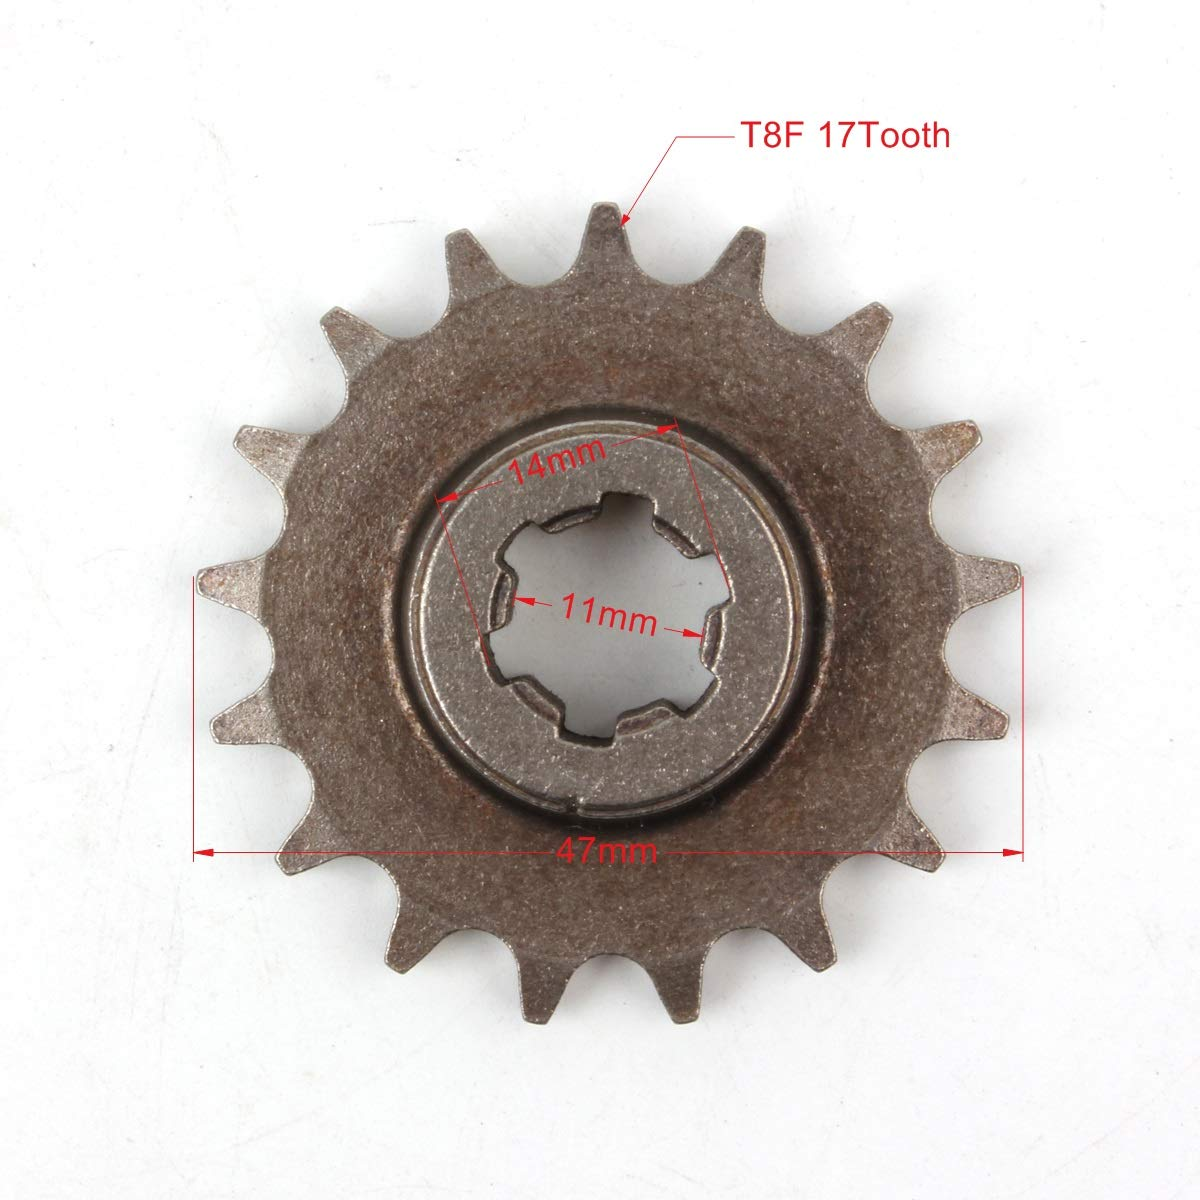 Pi/ñ/ón frontal de embrague Pro CAKEN T8F 17T cadena de pi/ñ/ón 47 cc 49 cc Dirt Bike Minimoto T8F paso 17 dientes